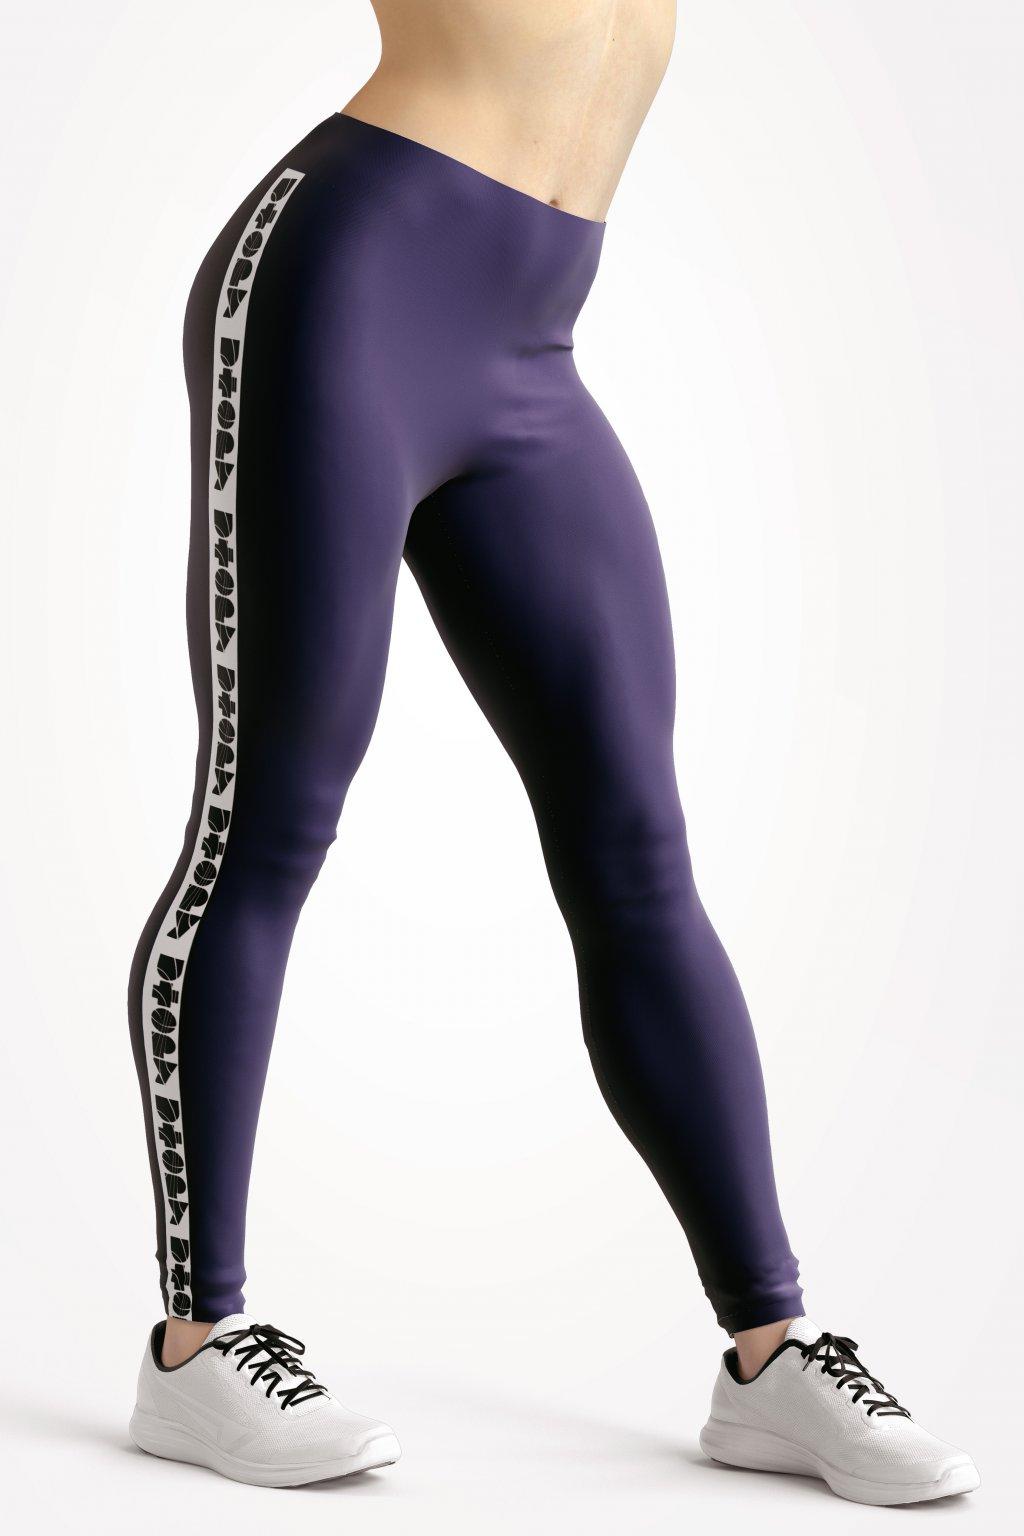 basic collection blue utopy leggings front by utopy v2